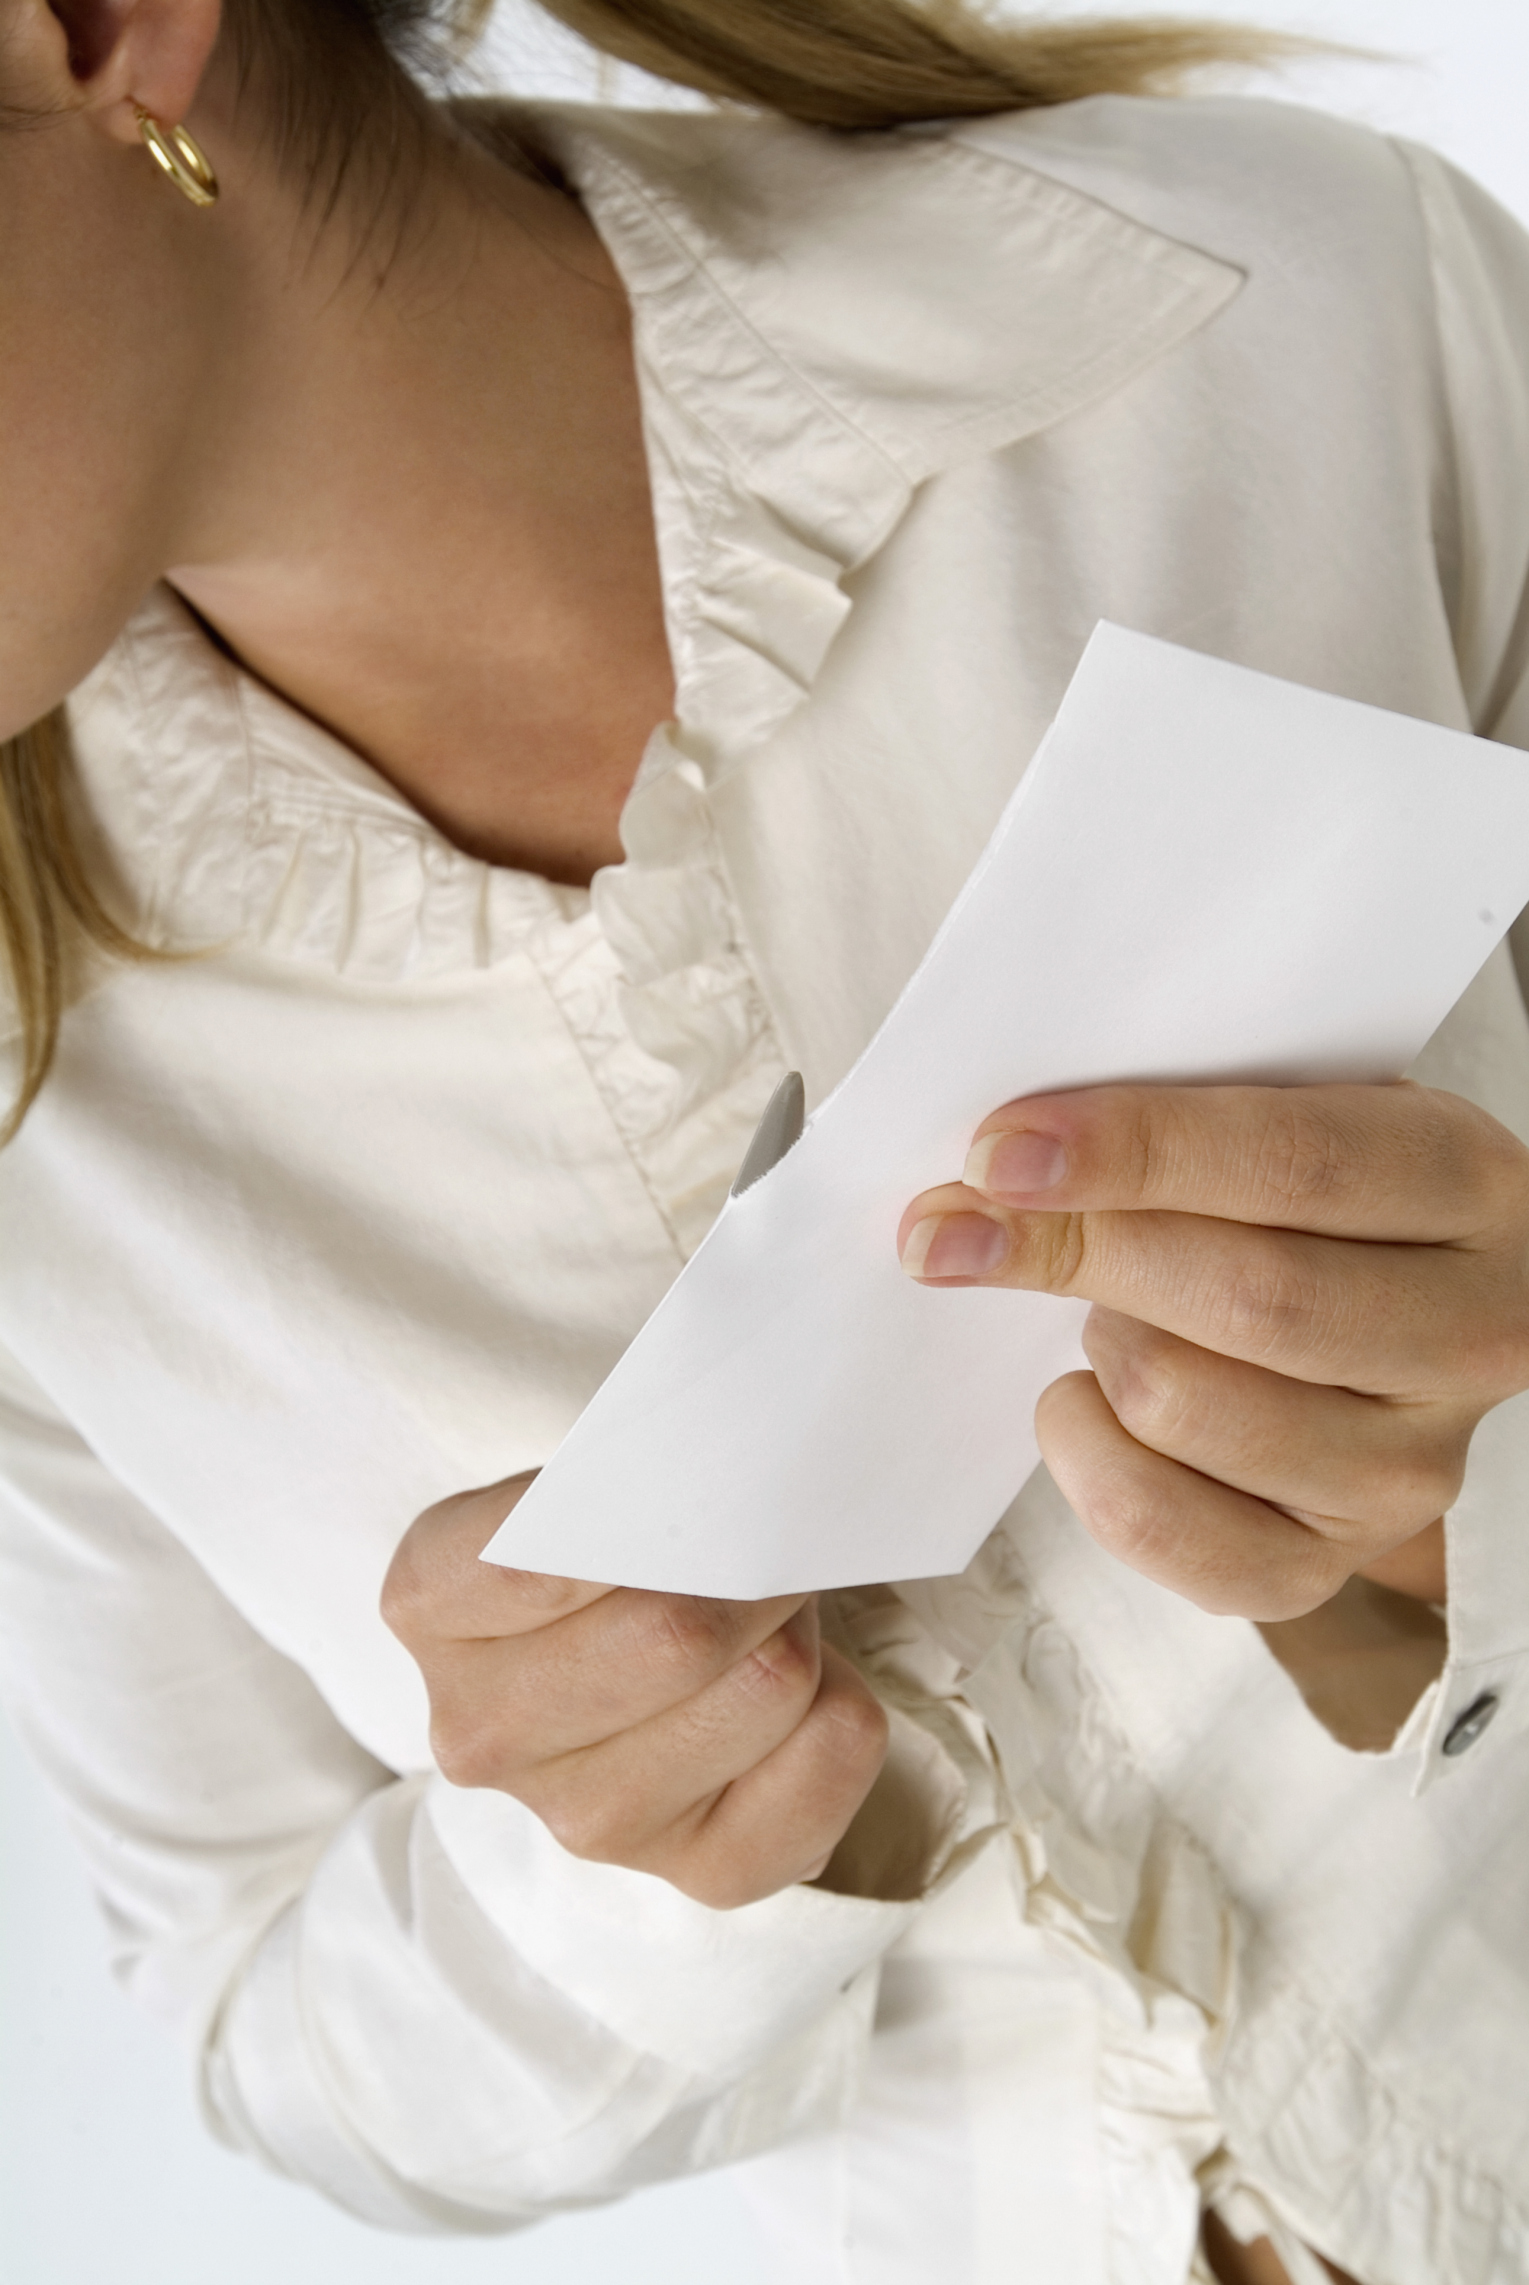 How to write a letter declining to refund money chron spiritdancerdesigns Choice Image